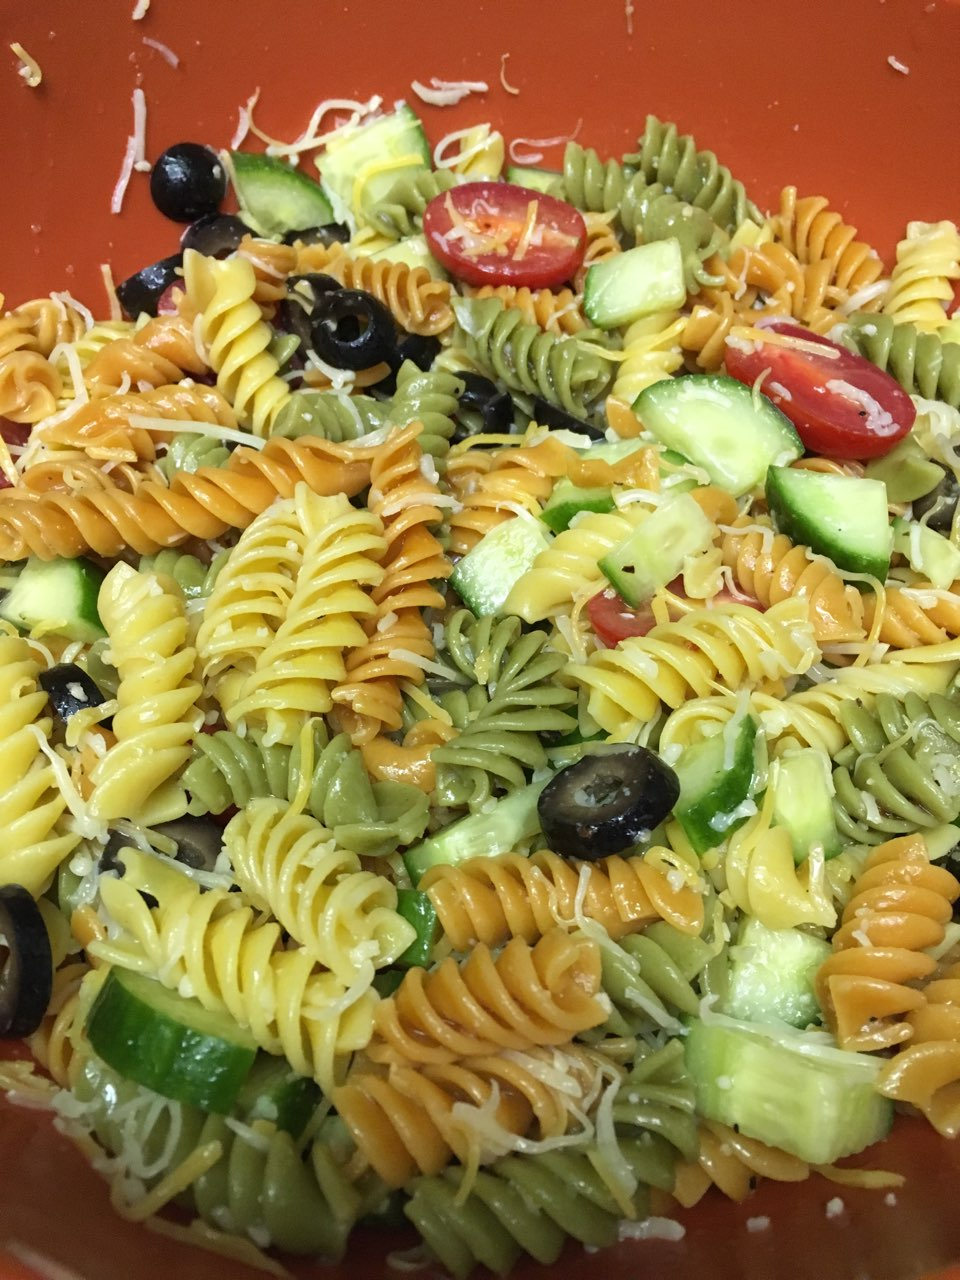 Garden Delight Pasta Salad